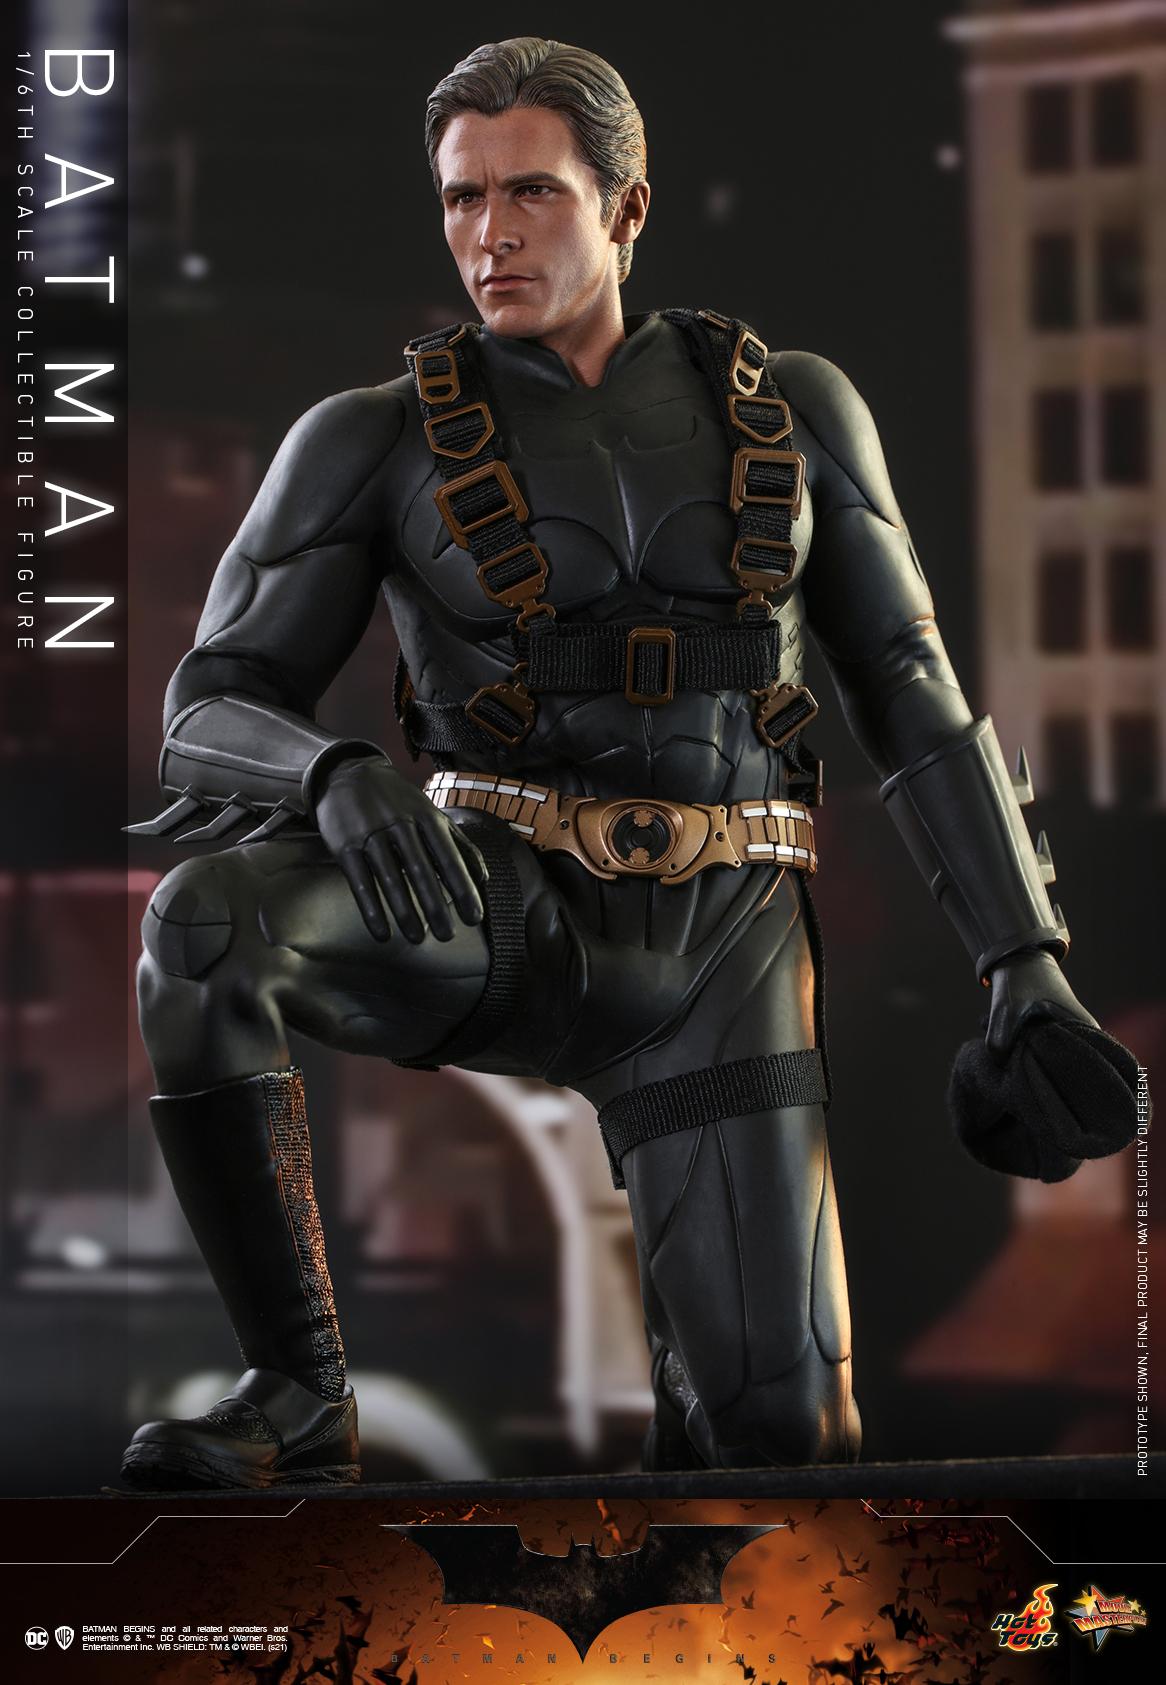 Hot Toys - Batman Begins - Batman collectible figure_PR15